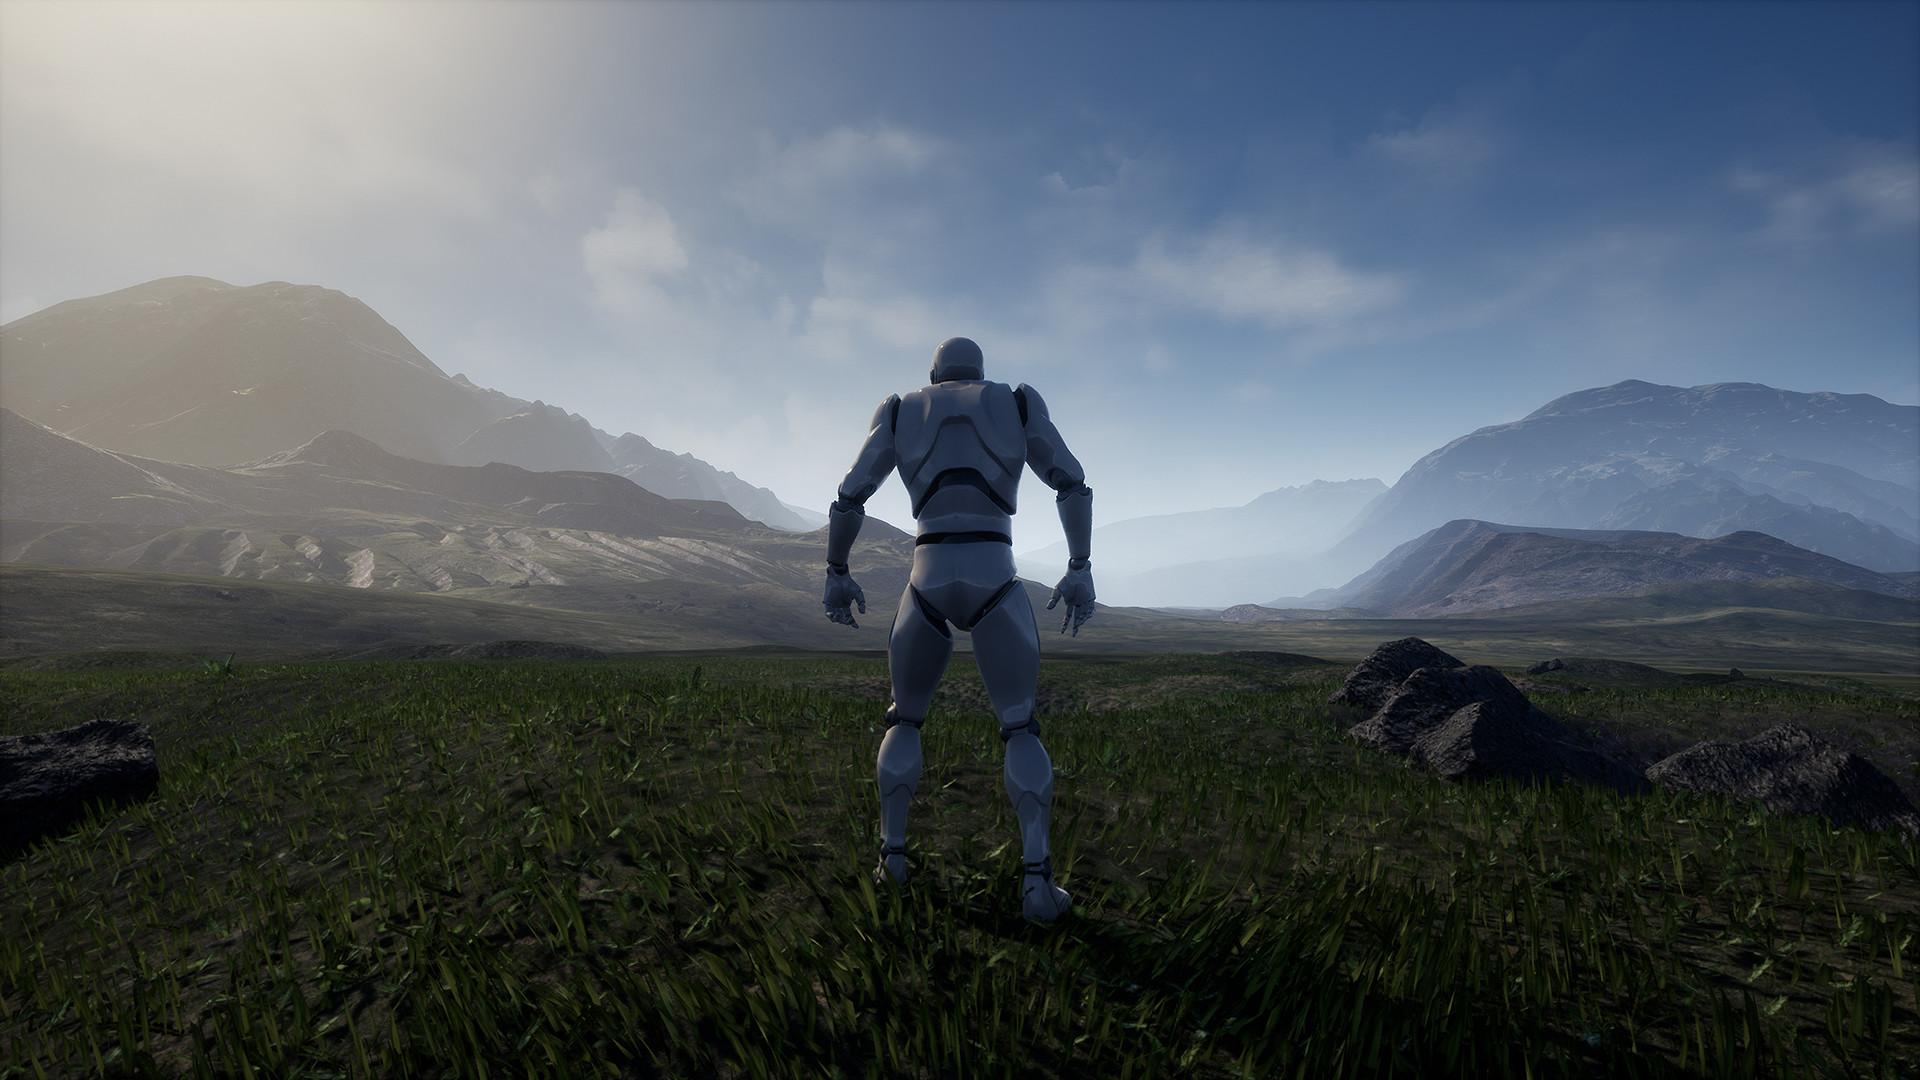 Joe garth grasslands gameplay 02 1080p